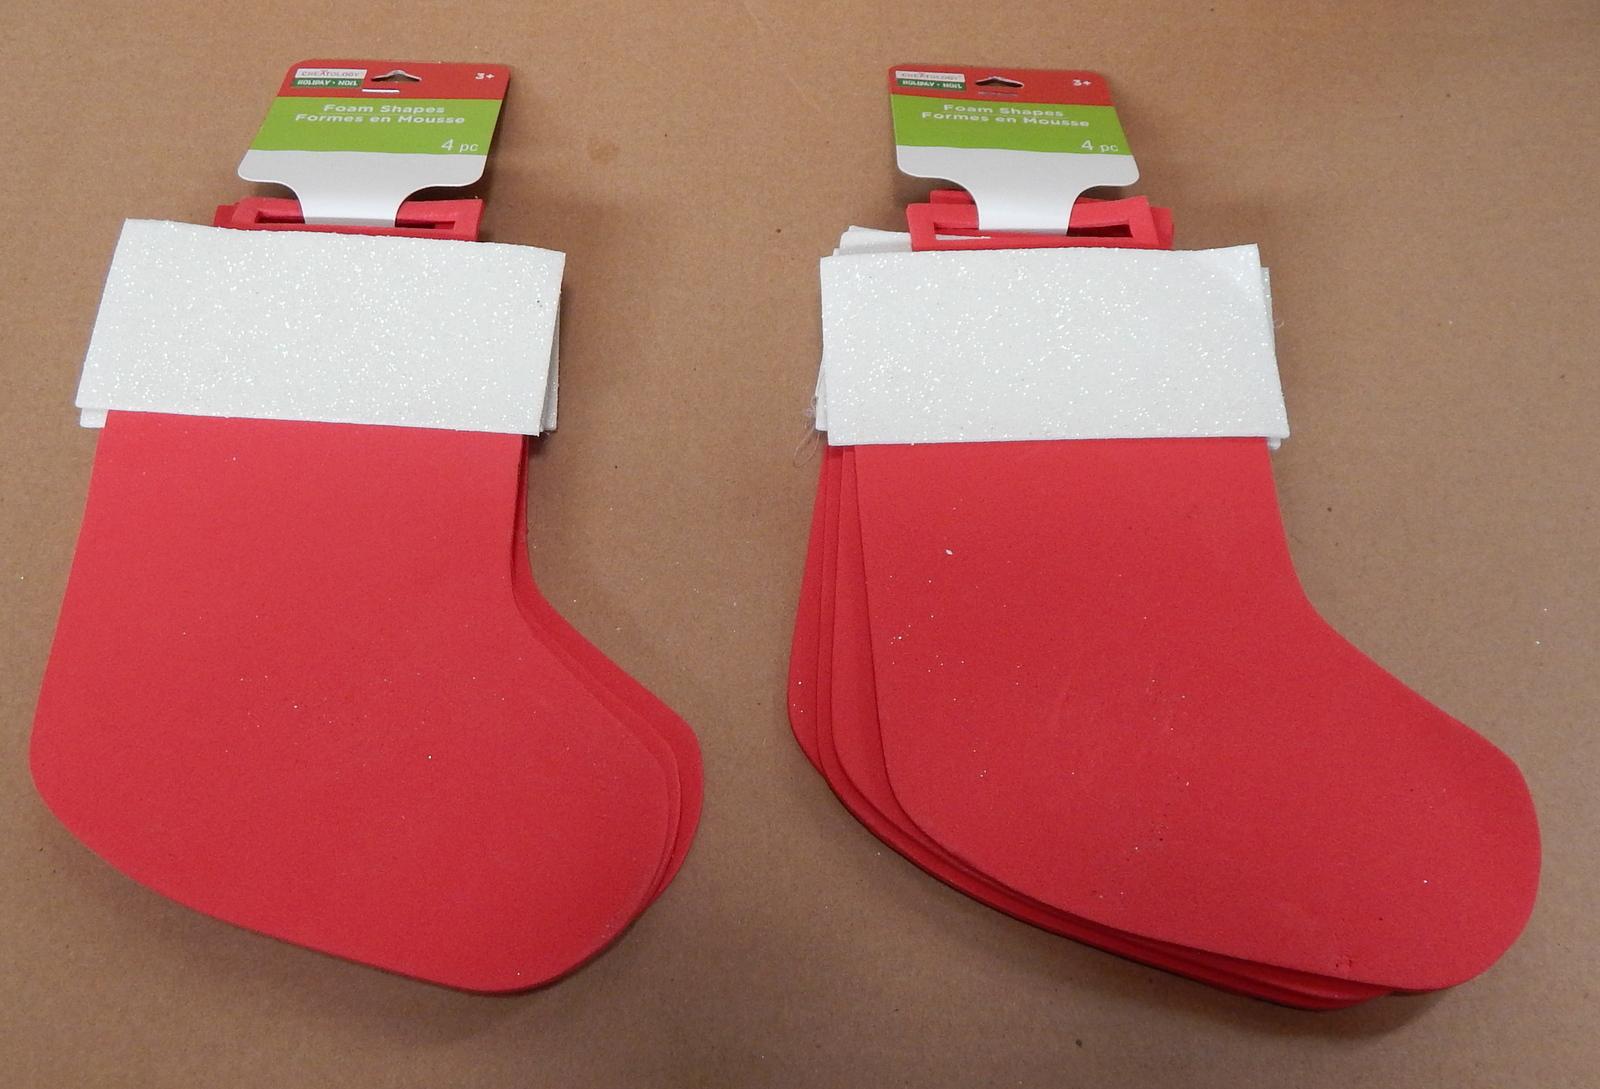 foam shapes creatology holiday 8pc 8x 6 michaels 3 christmas stockings 54k - Michaels Christmas Stockings